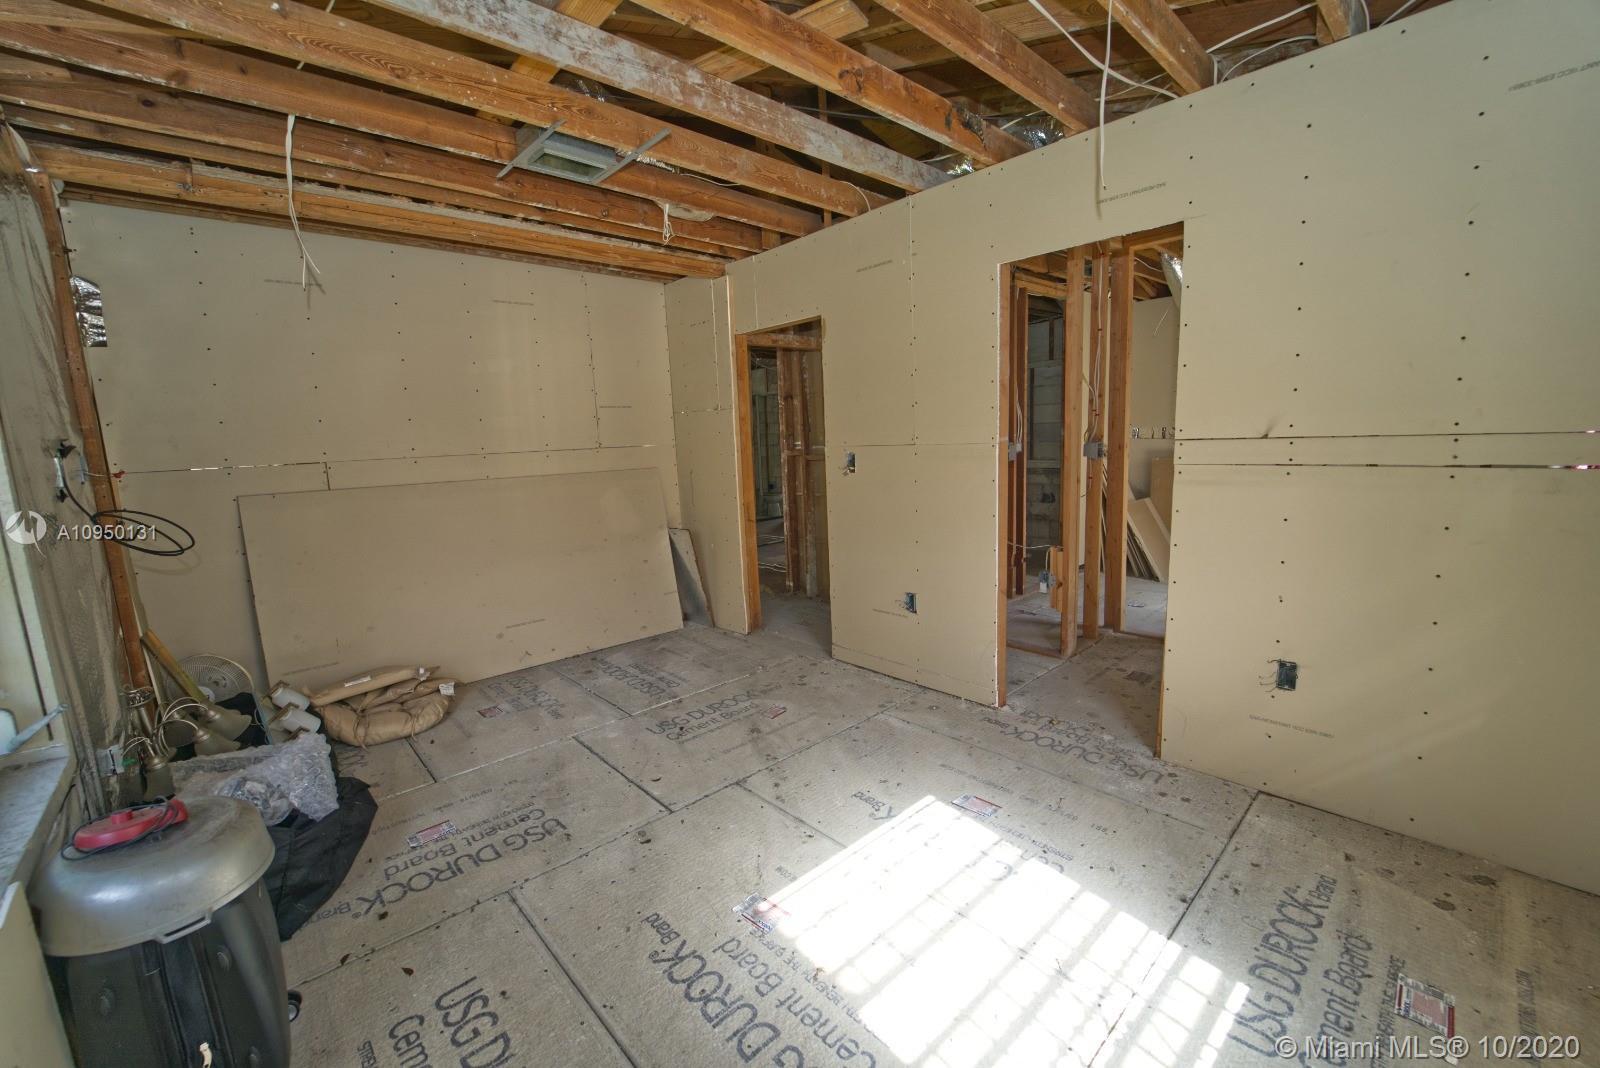 Bedroom. New sheetrock on walls. New durock on floors.